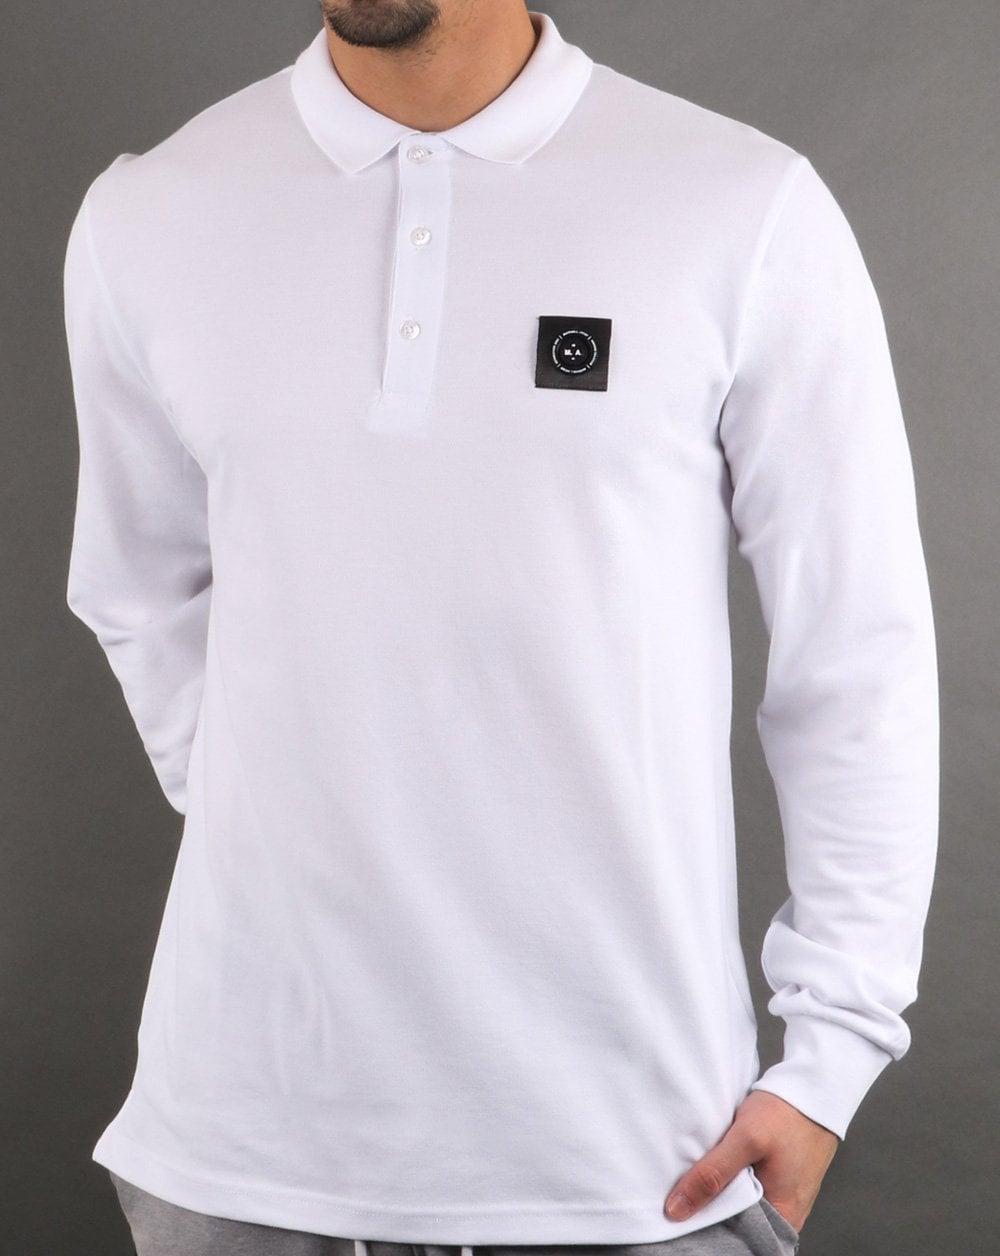 Marshall Artist Long Sleeve Polo Shirt In White Mens Clothing White